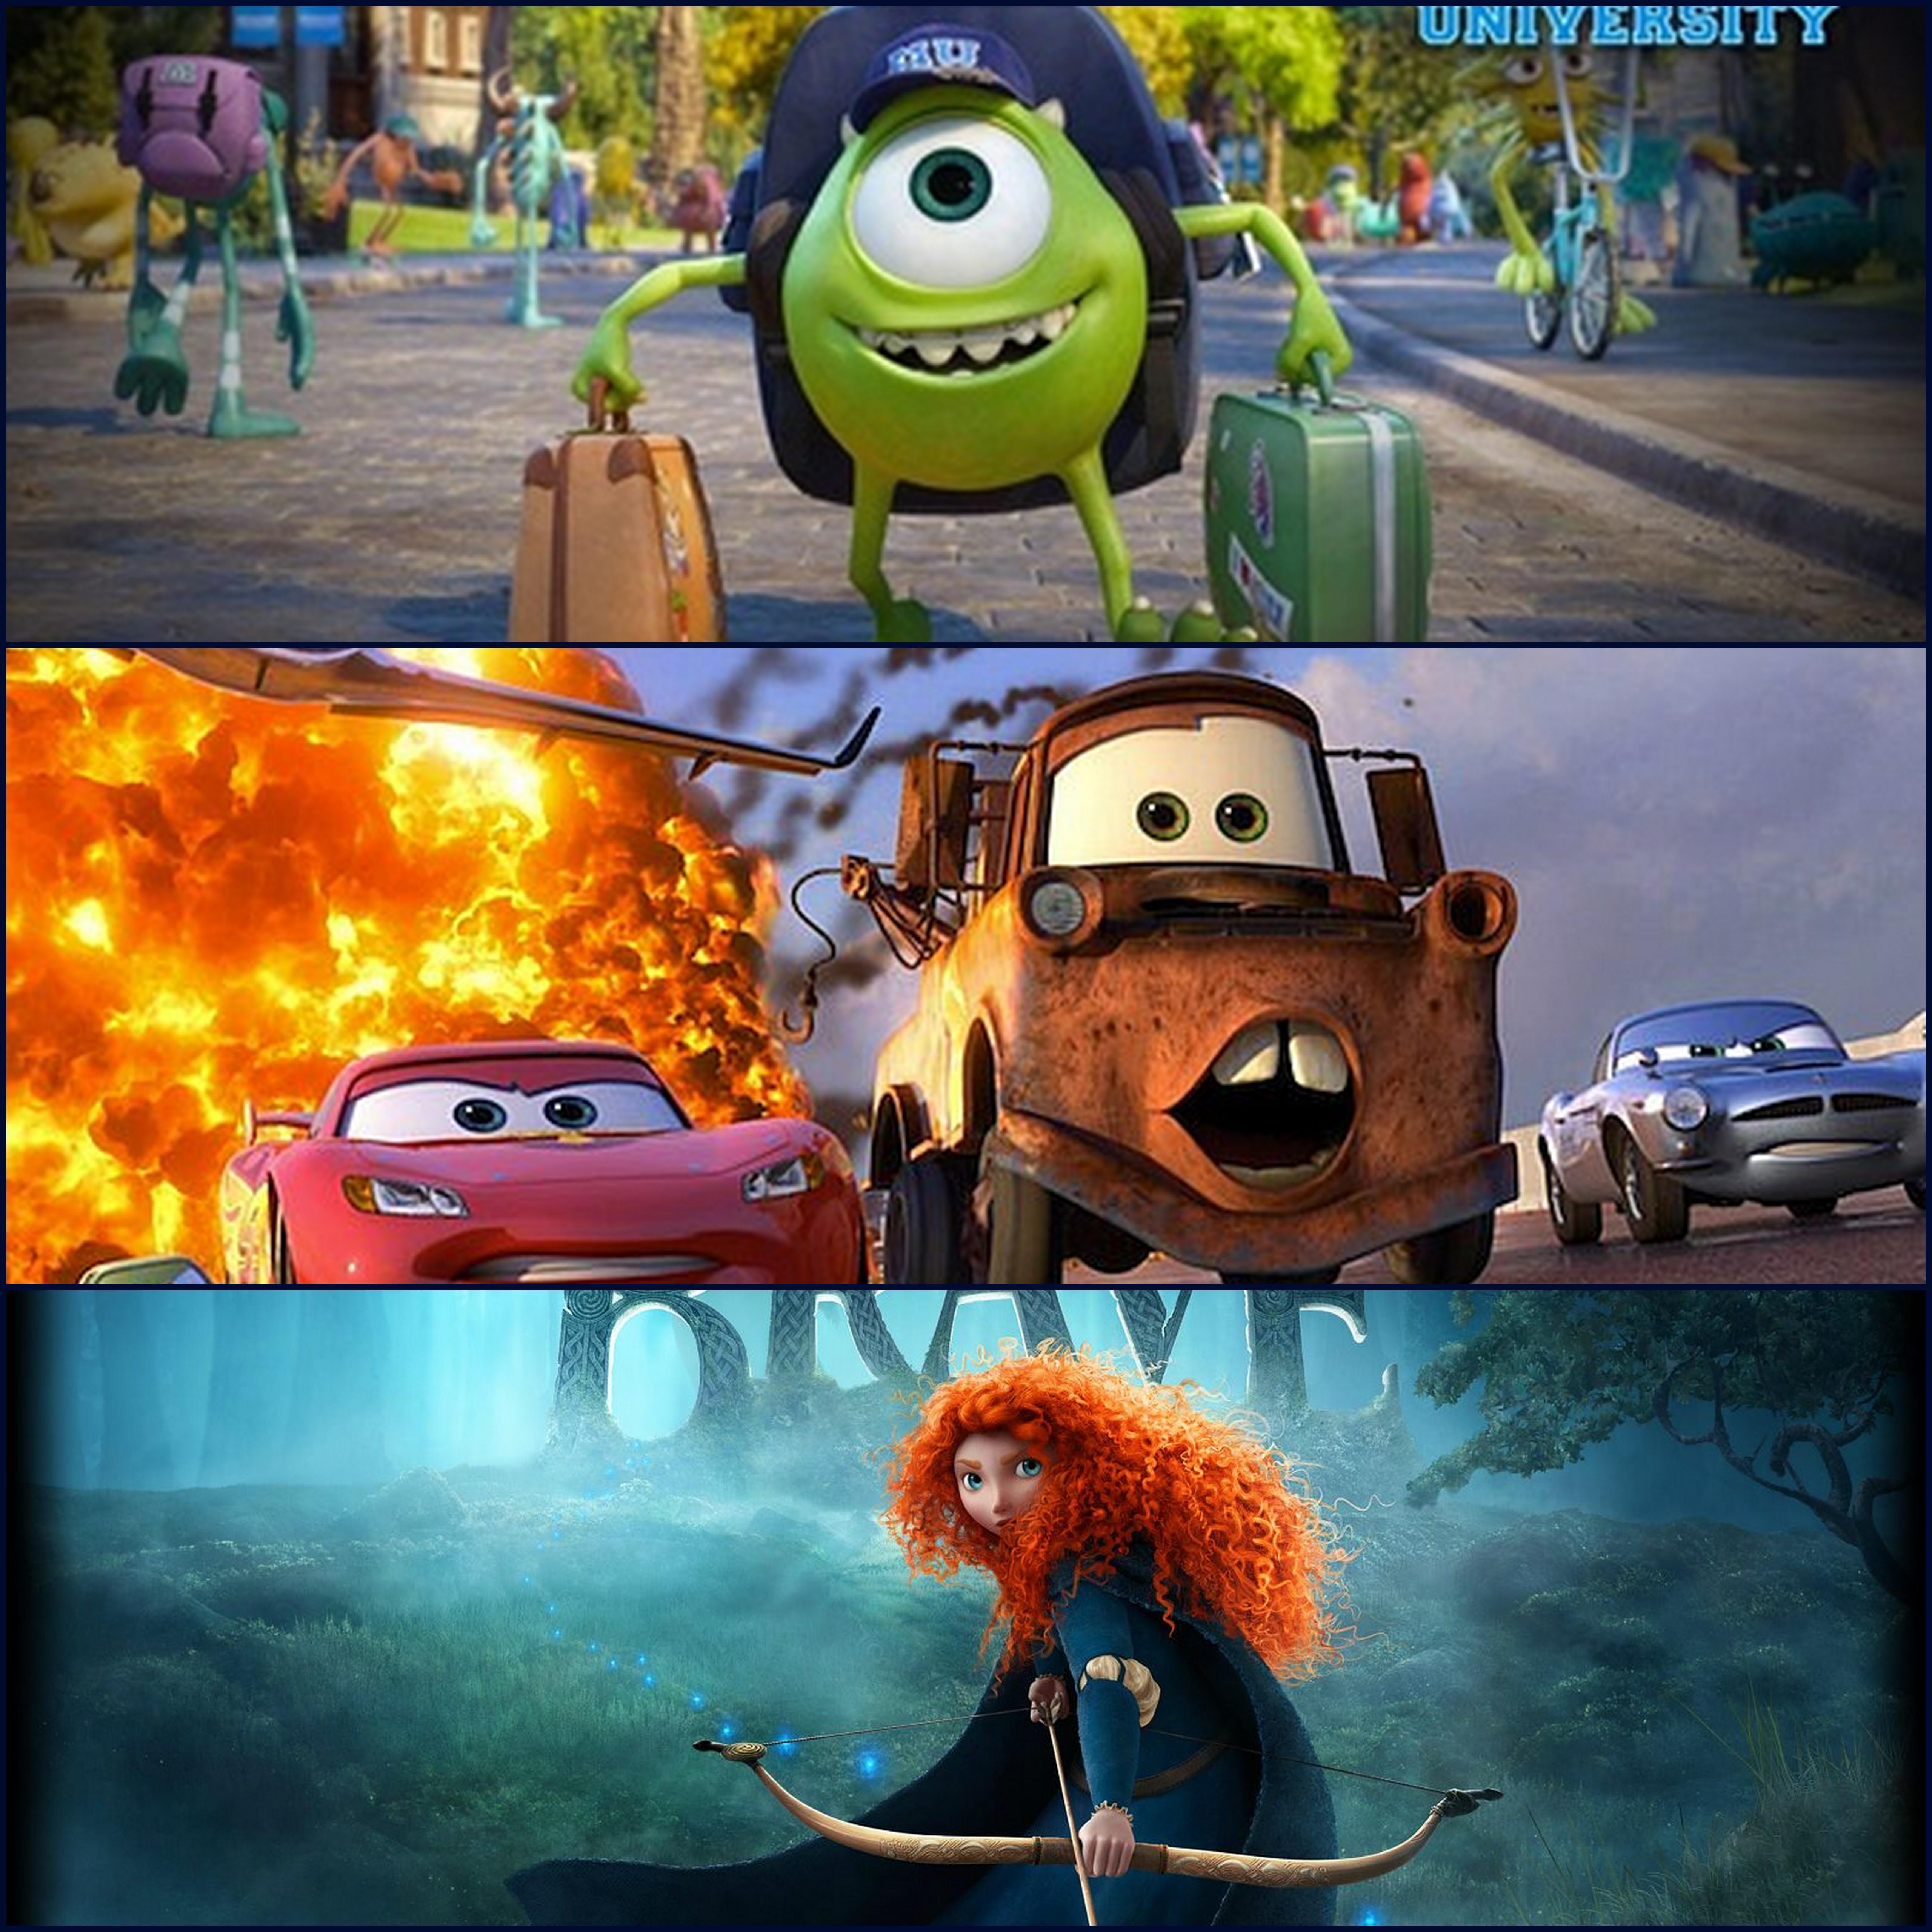 Collages1 bad movies u2013 Page 2 u2013